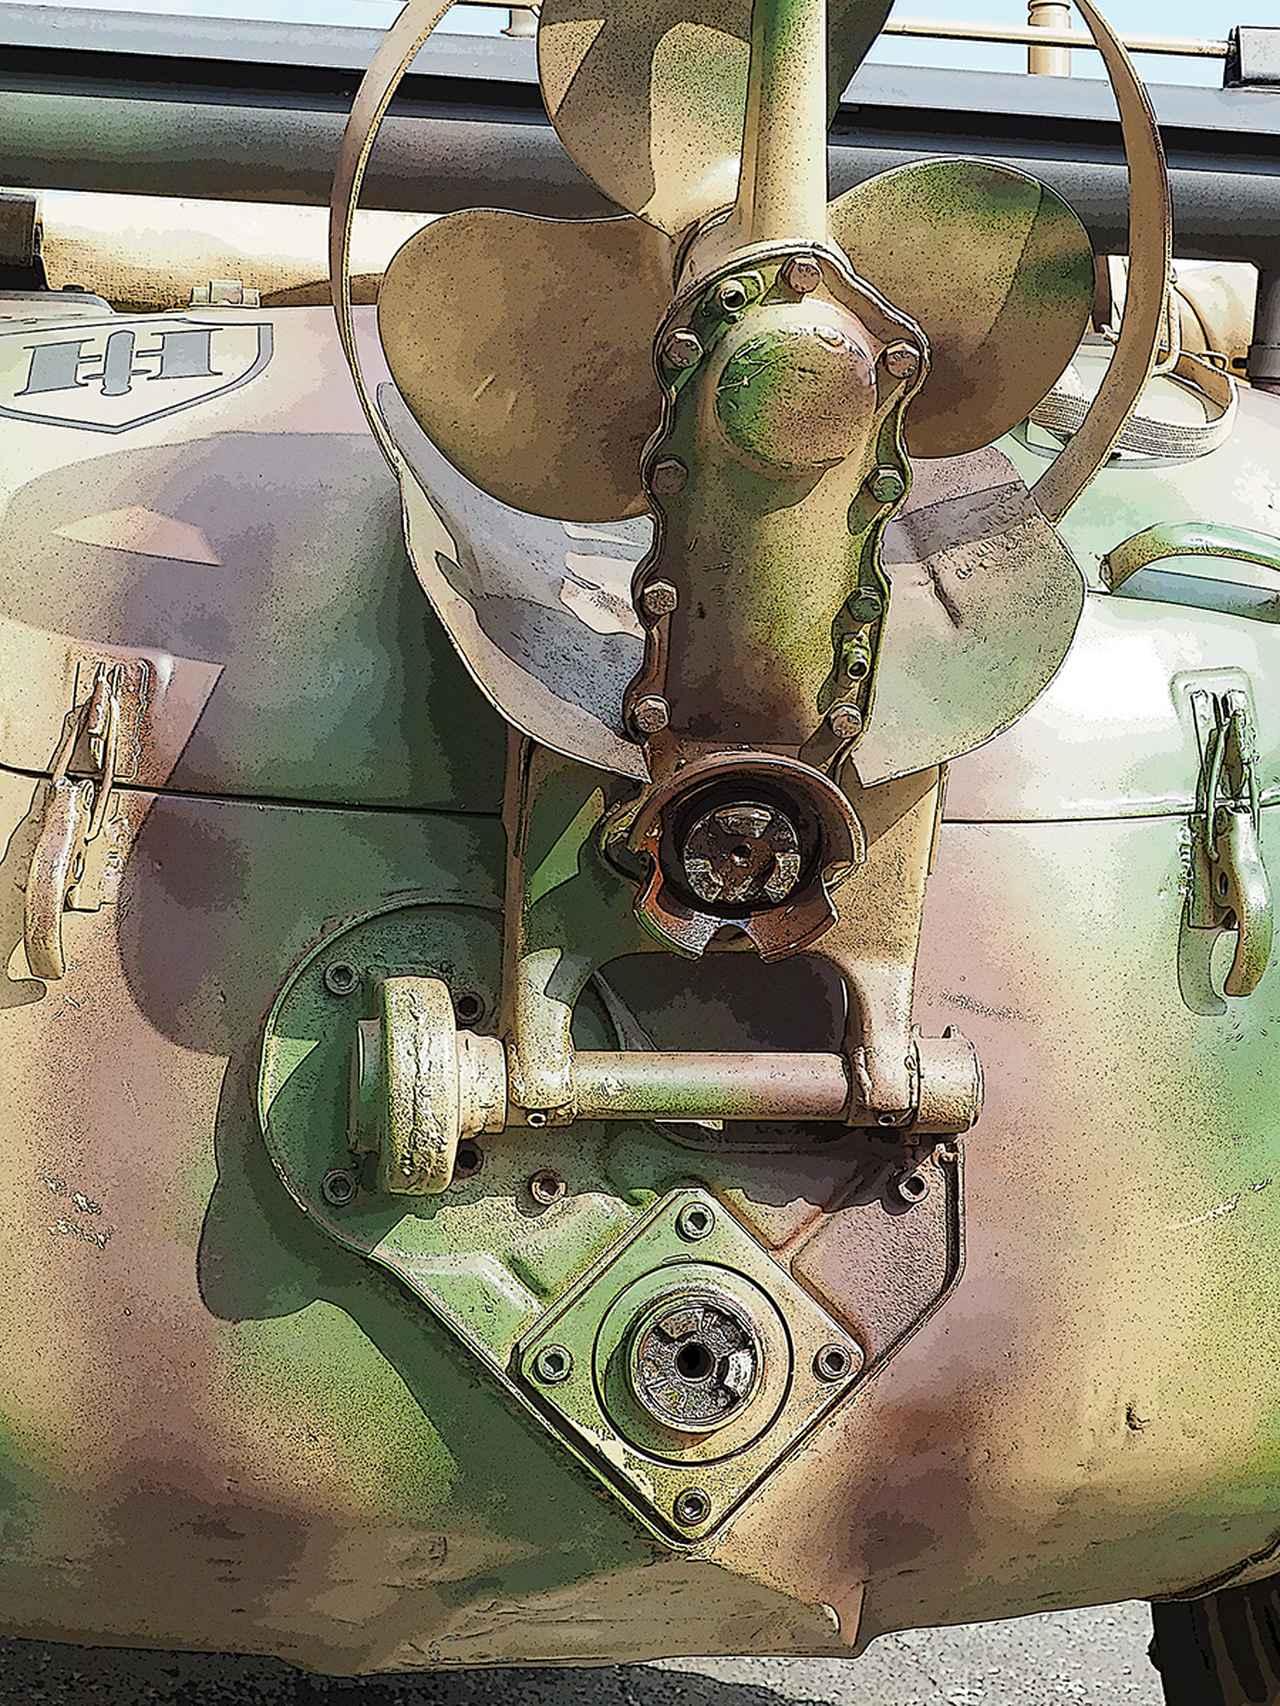 Images : 3番目の画像 - モンスターマシン 029 シュビムワーゲン - LAWRENCE - Motorcycle x Cars + α = Your Life.